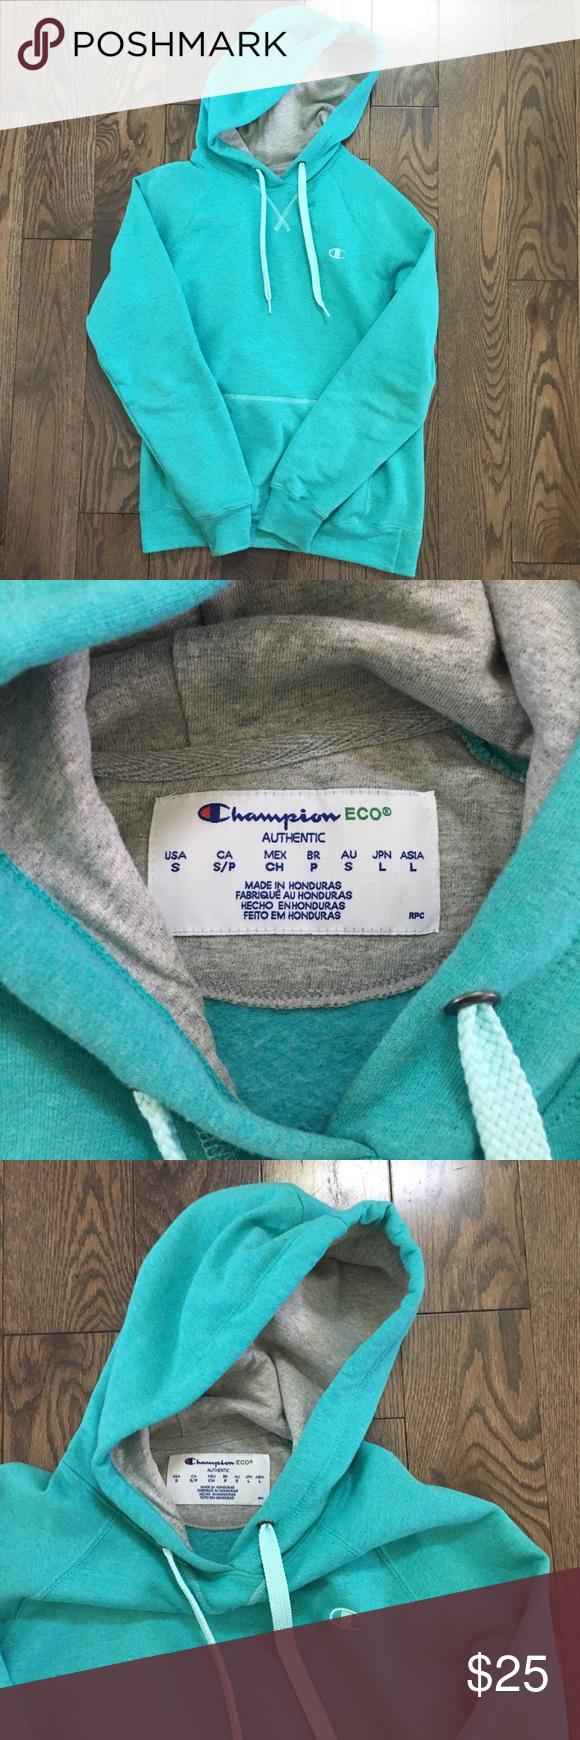 Champion Sweatshirt Hoodie Blue Turquoise Sz S Champion Sweatshirt In Pretty Tiffany Blue Turquoise Color Sup Champion Sweatshirt Clothes Design Champion Tops [ 1740 x 580 Pixel ]